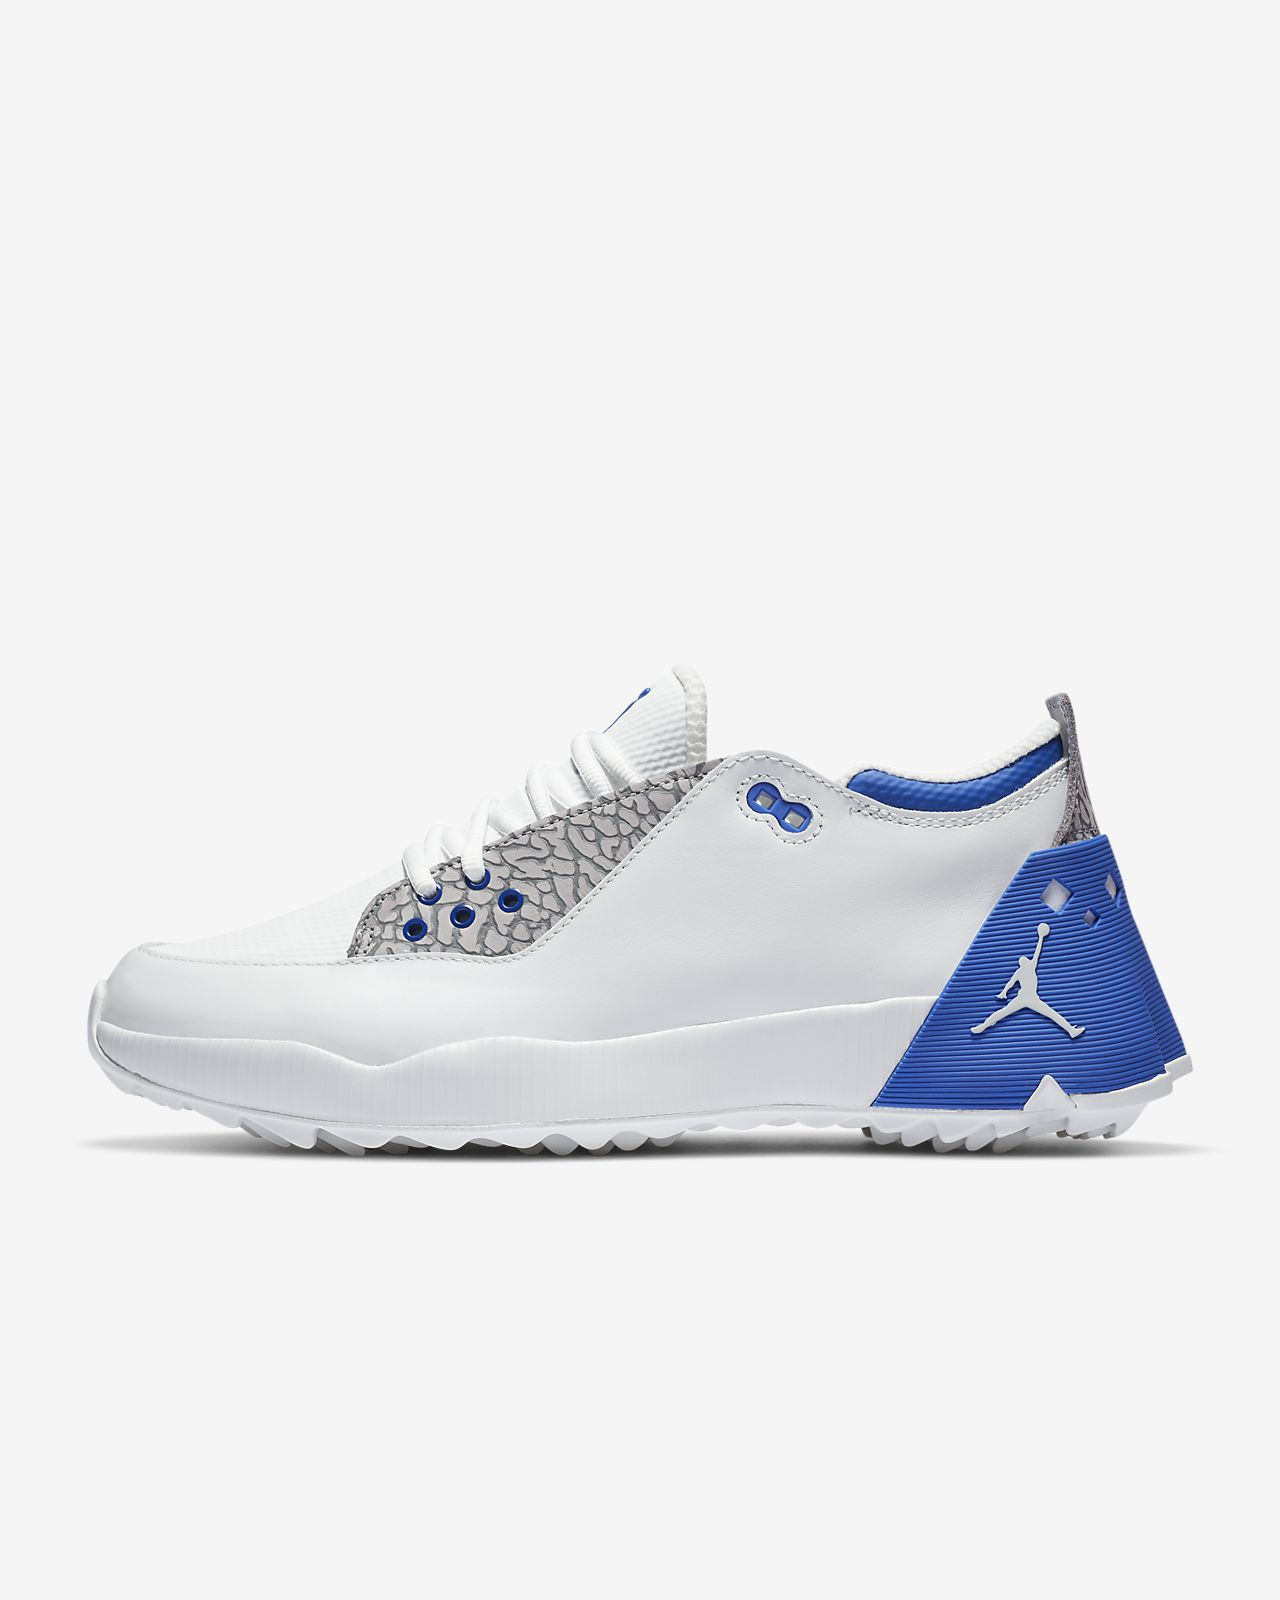 Jordan ADG 2 男子高尔夫球鞋